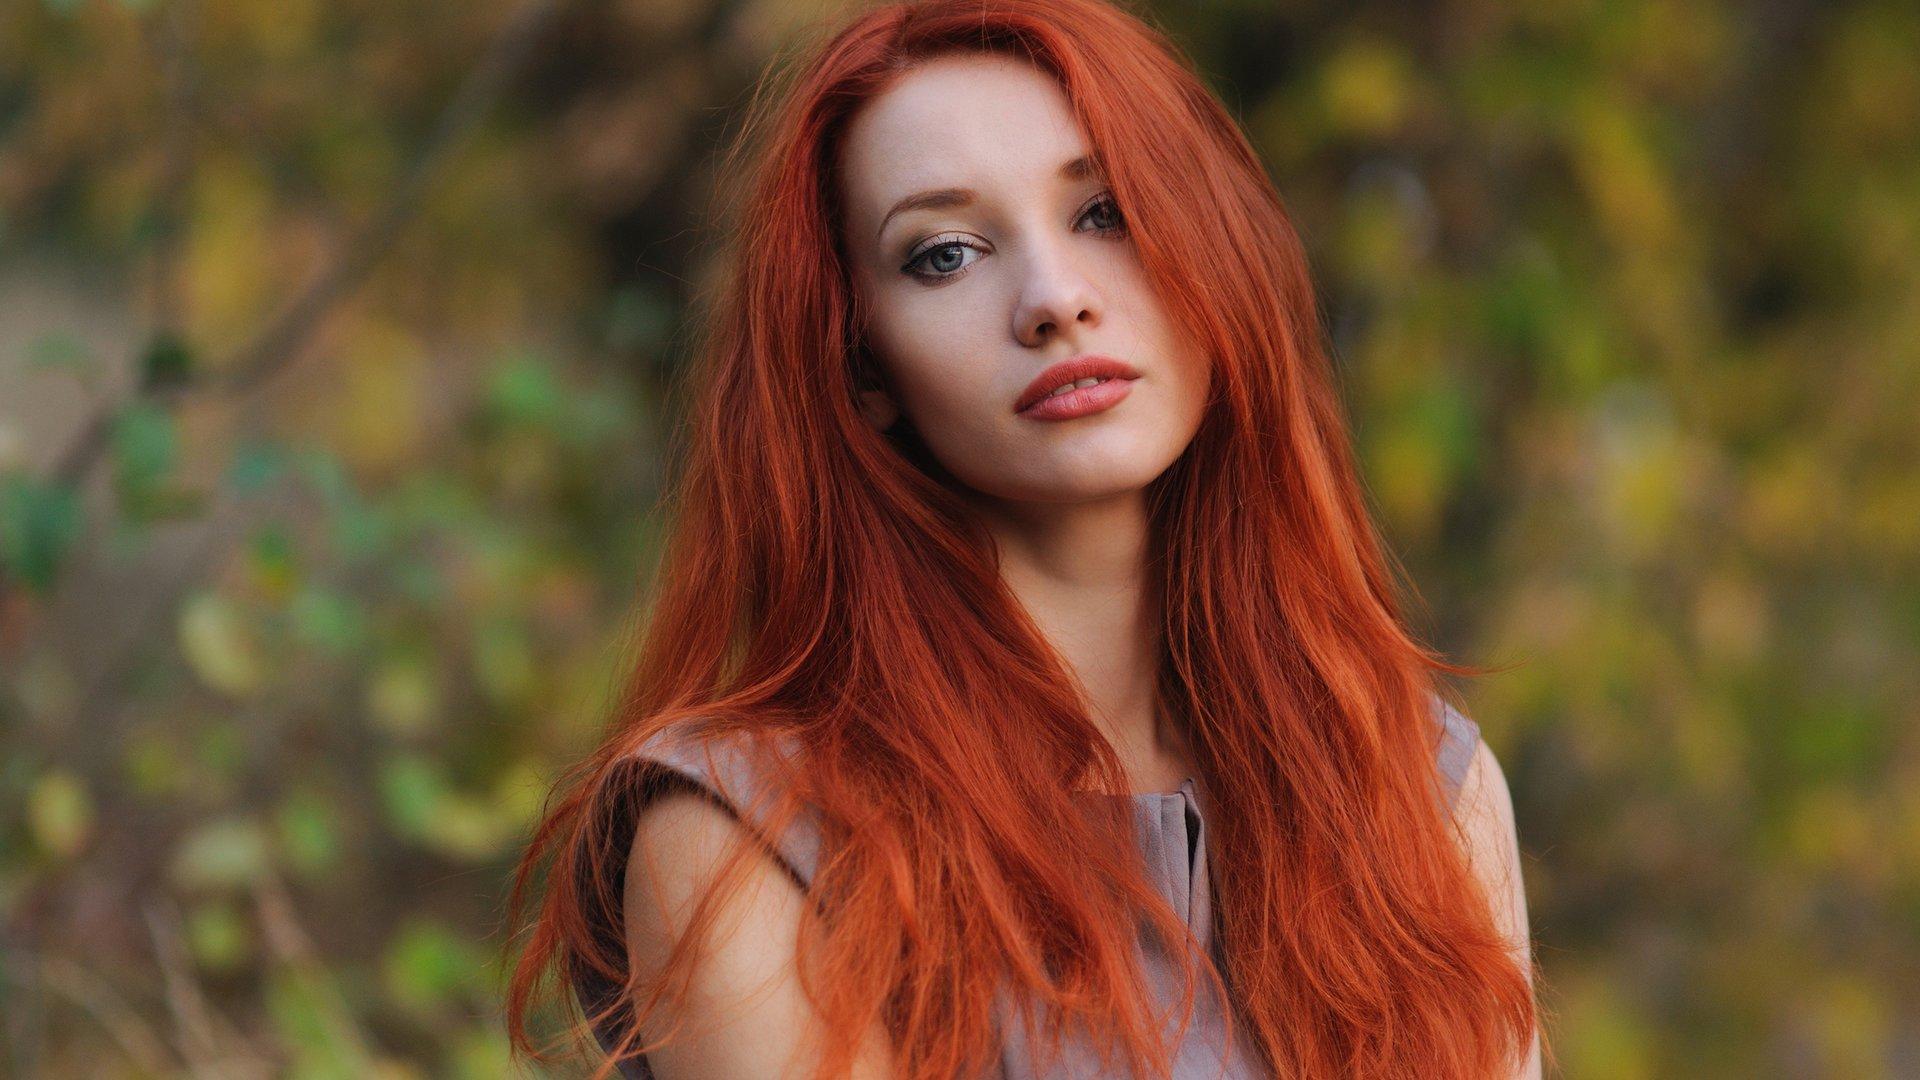 Rote braune haare augen Rote haare